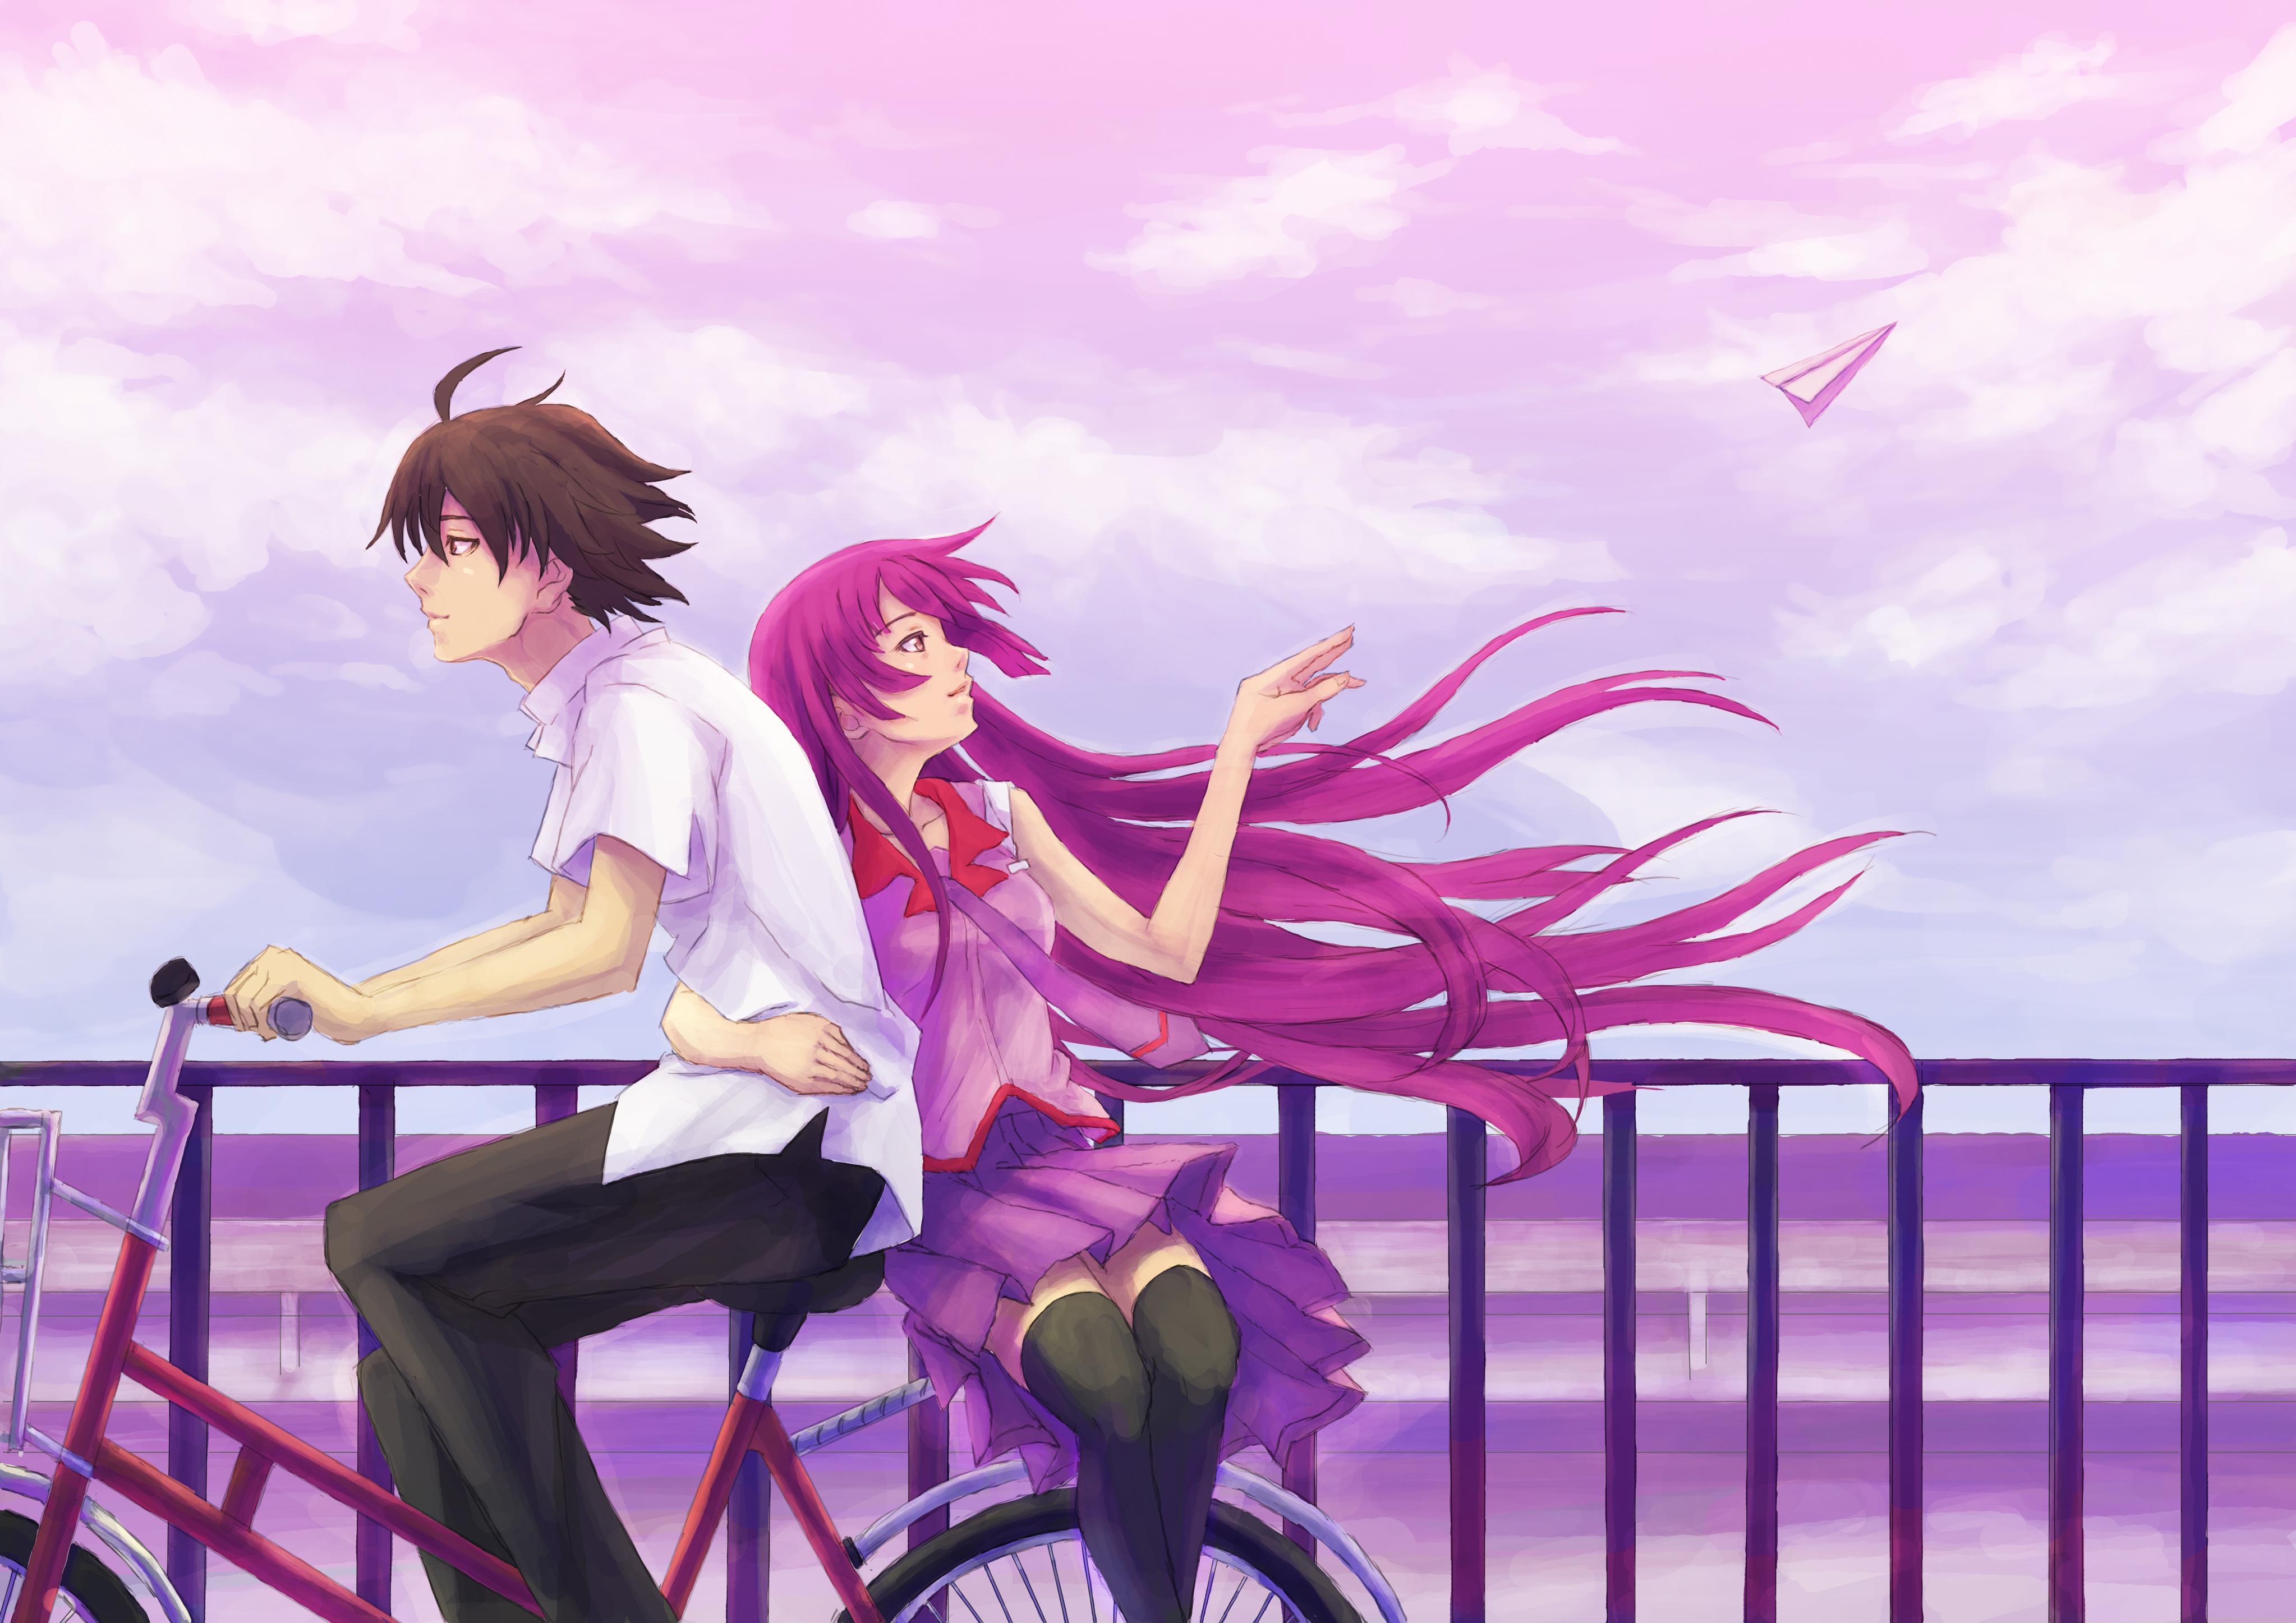 anime boy girl cycle 4k, hd anime, 4k wallpapers, images